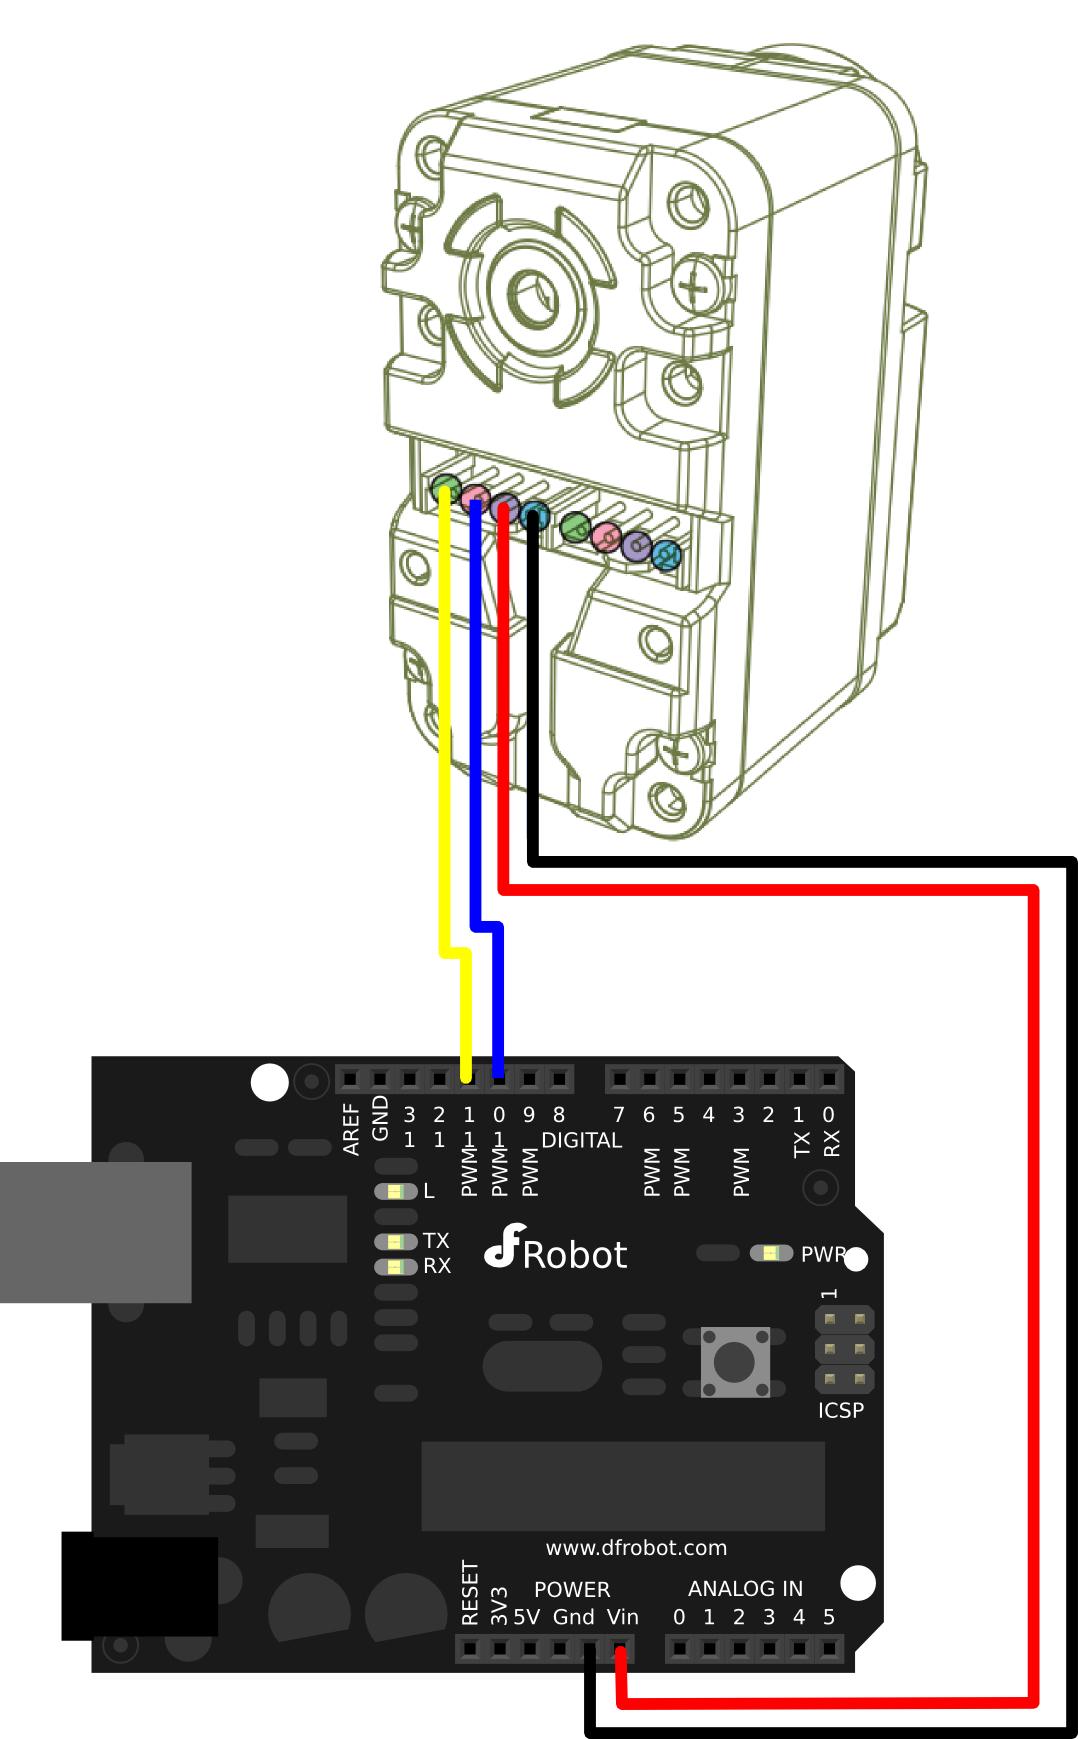 HerkuleX_UNO drs 0101 herkulex smart servo dfrobot Servo Hydraulic Diagram at bakdesigns.co